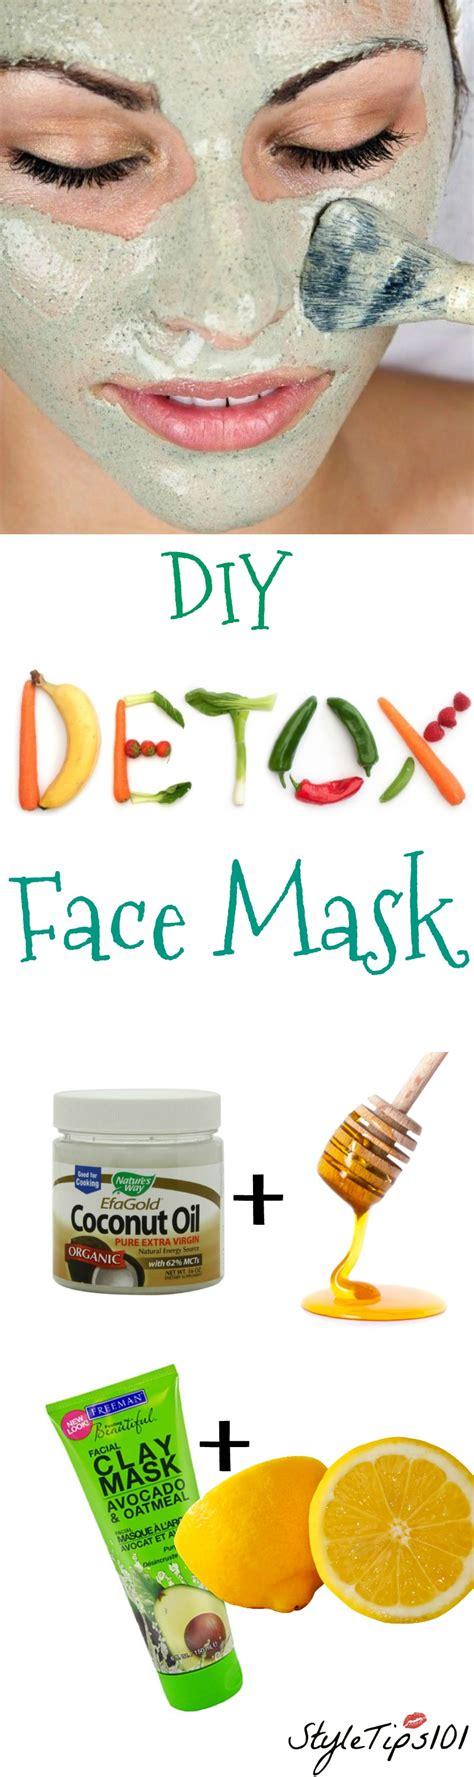 Detox Diy Mask by Diy Detox Mask